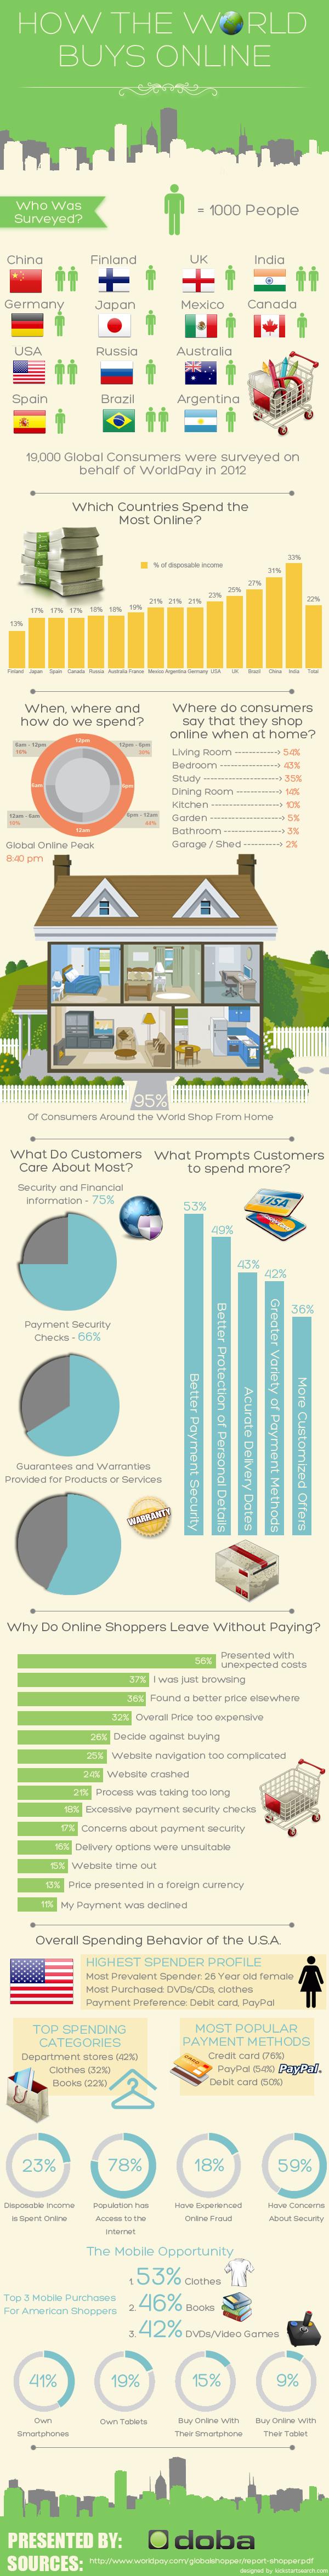 Online Spending 2012-Infographic